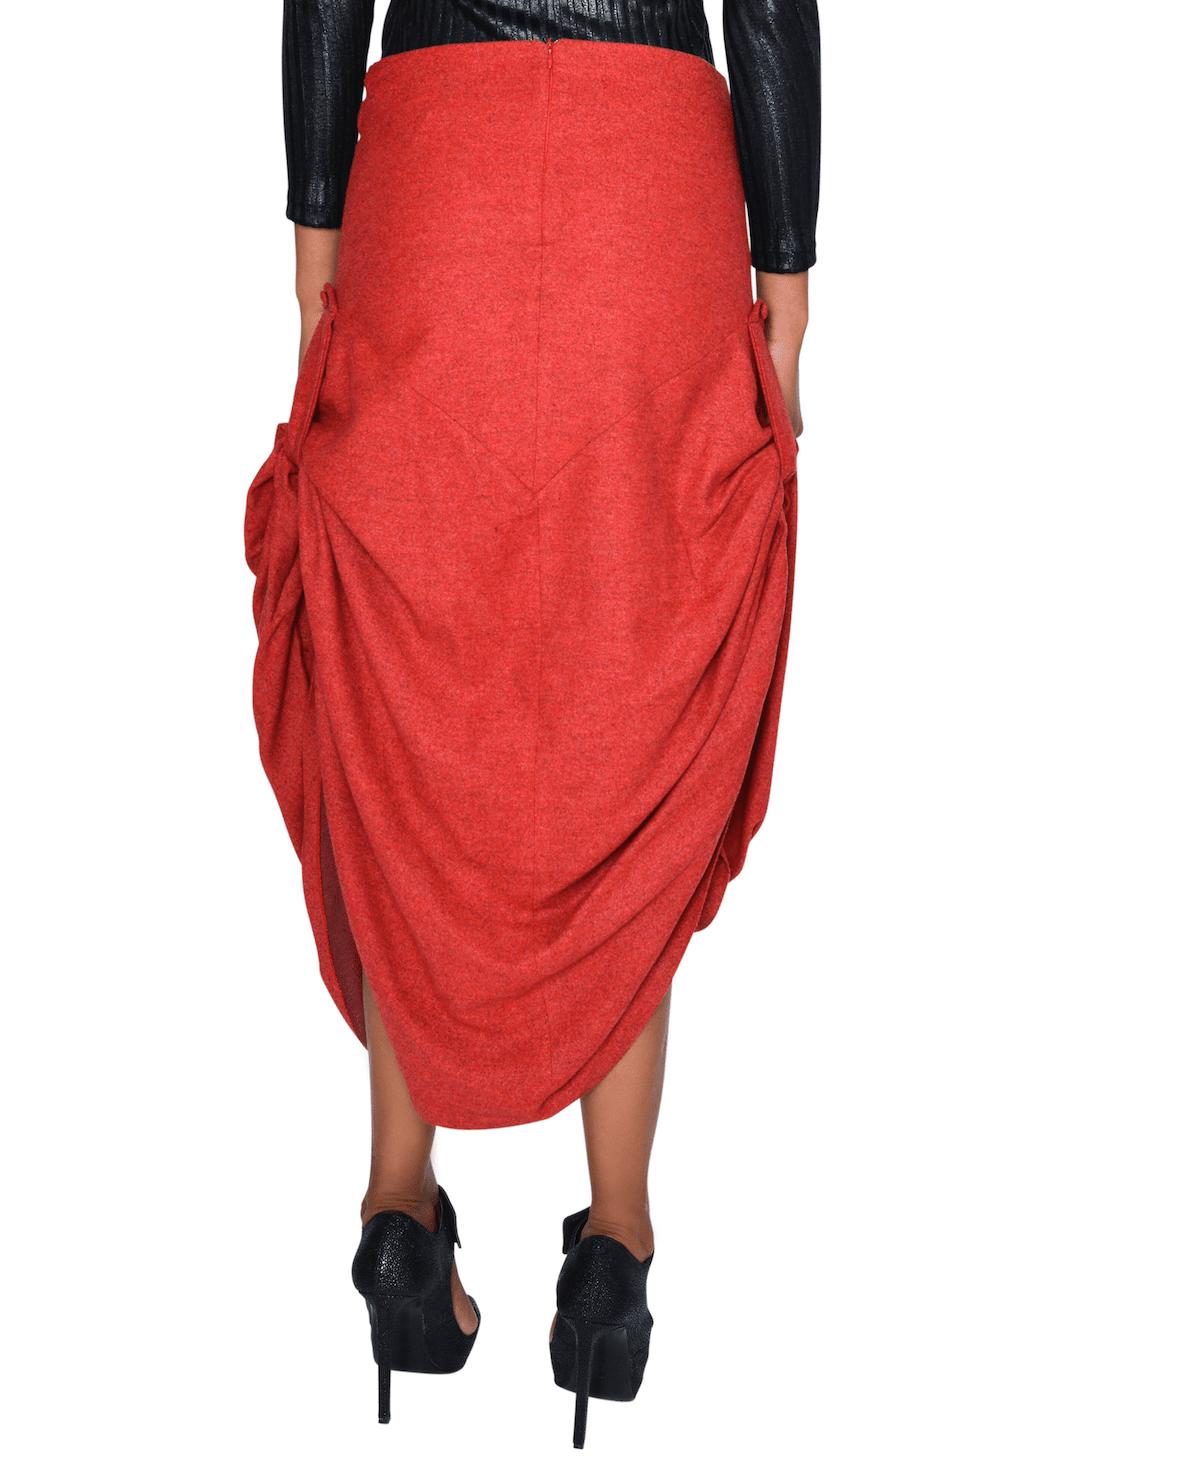 Skirt PLEINE 3